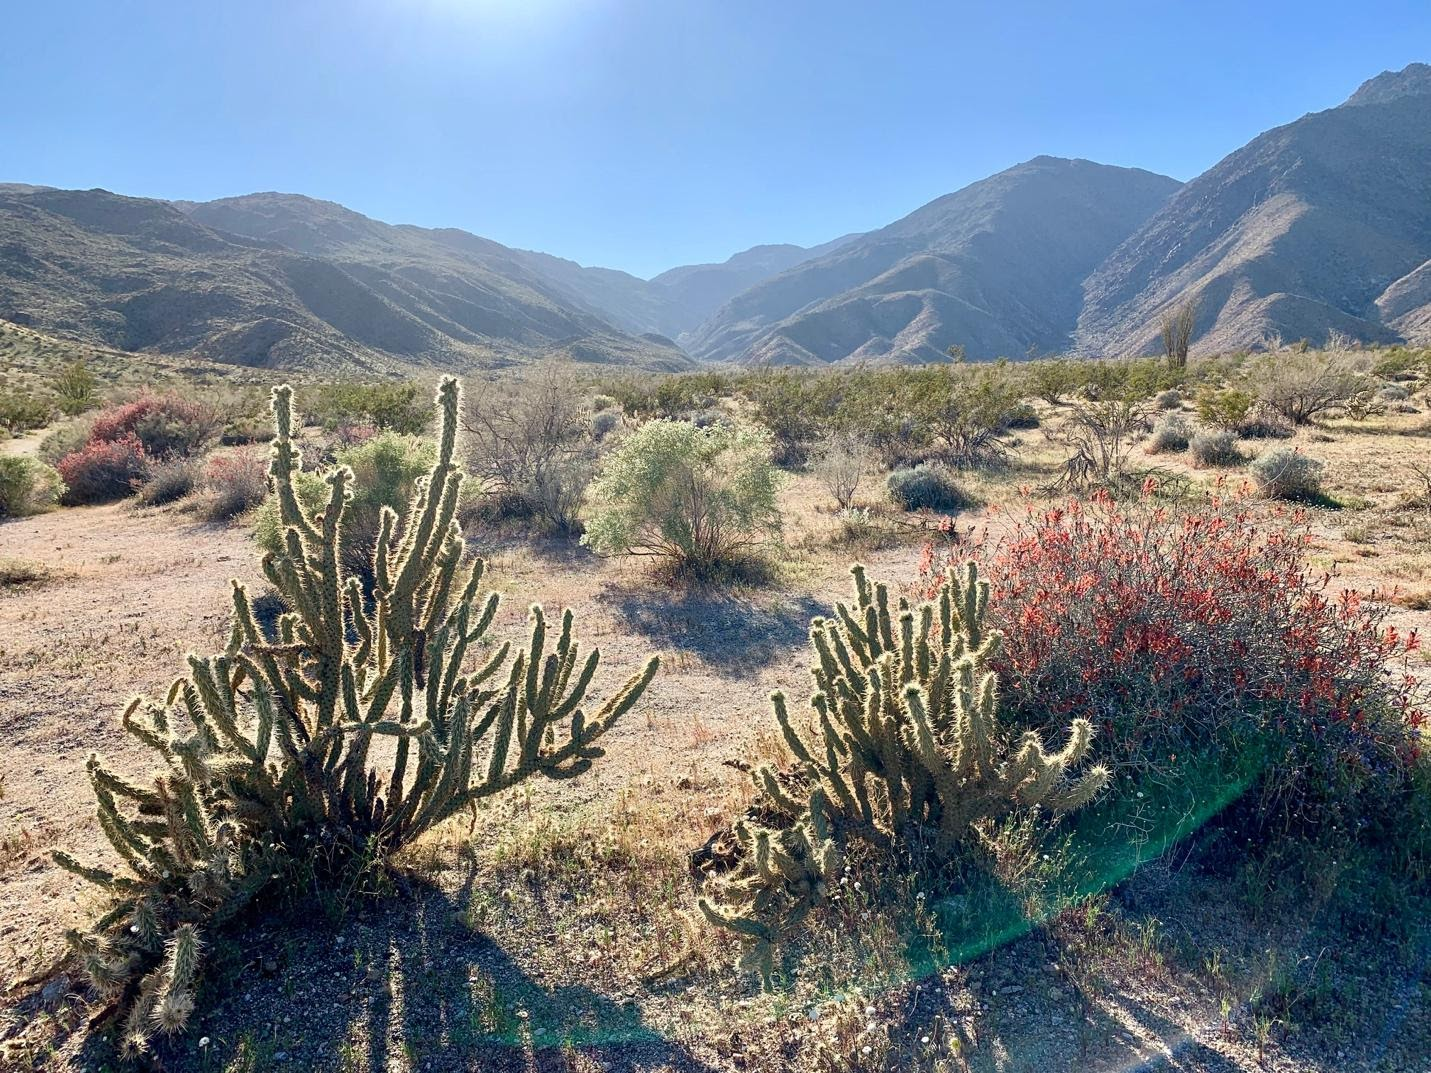 The Anza-Borrego desert landscape with cactuses.